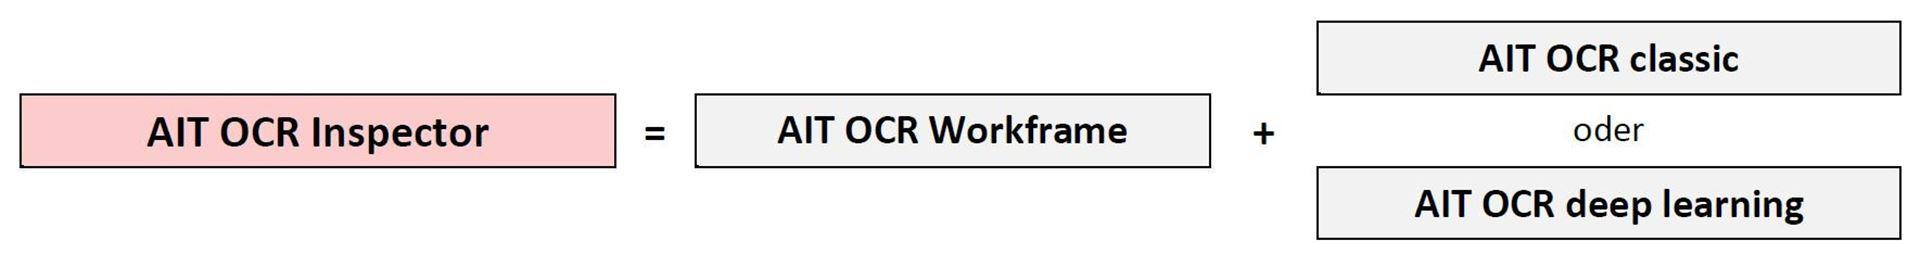 AIT OCR Inspector = AIT OCR Workframe + AIT OCR classic oder AIT OCR deep learning